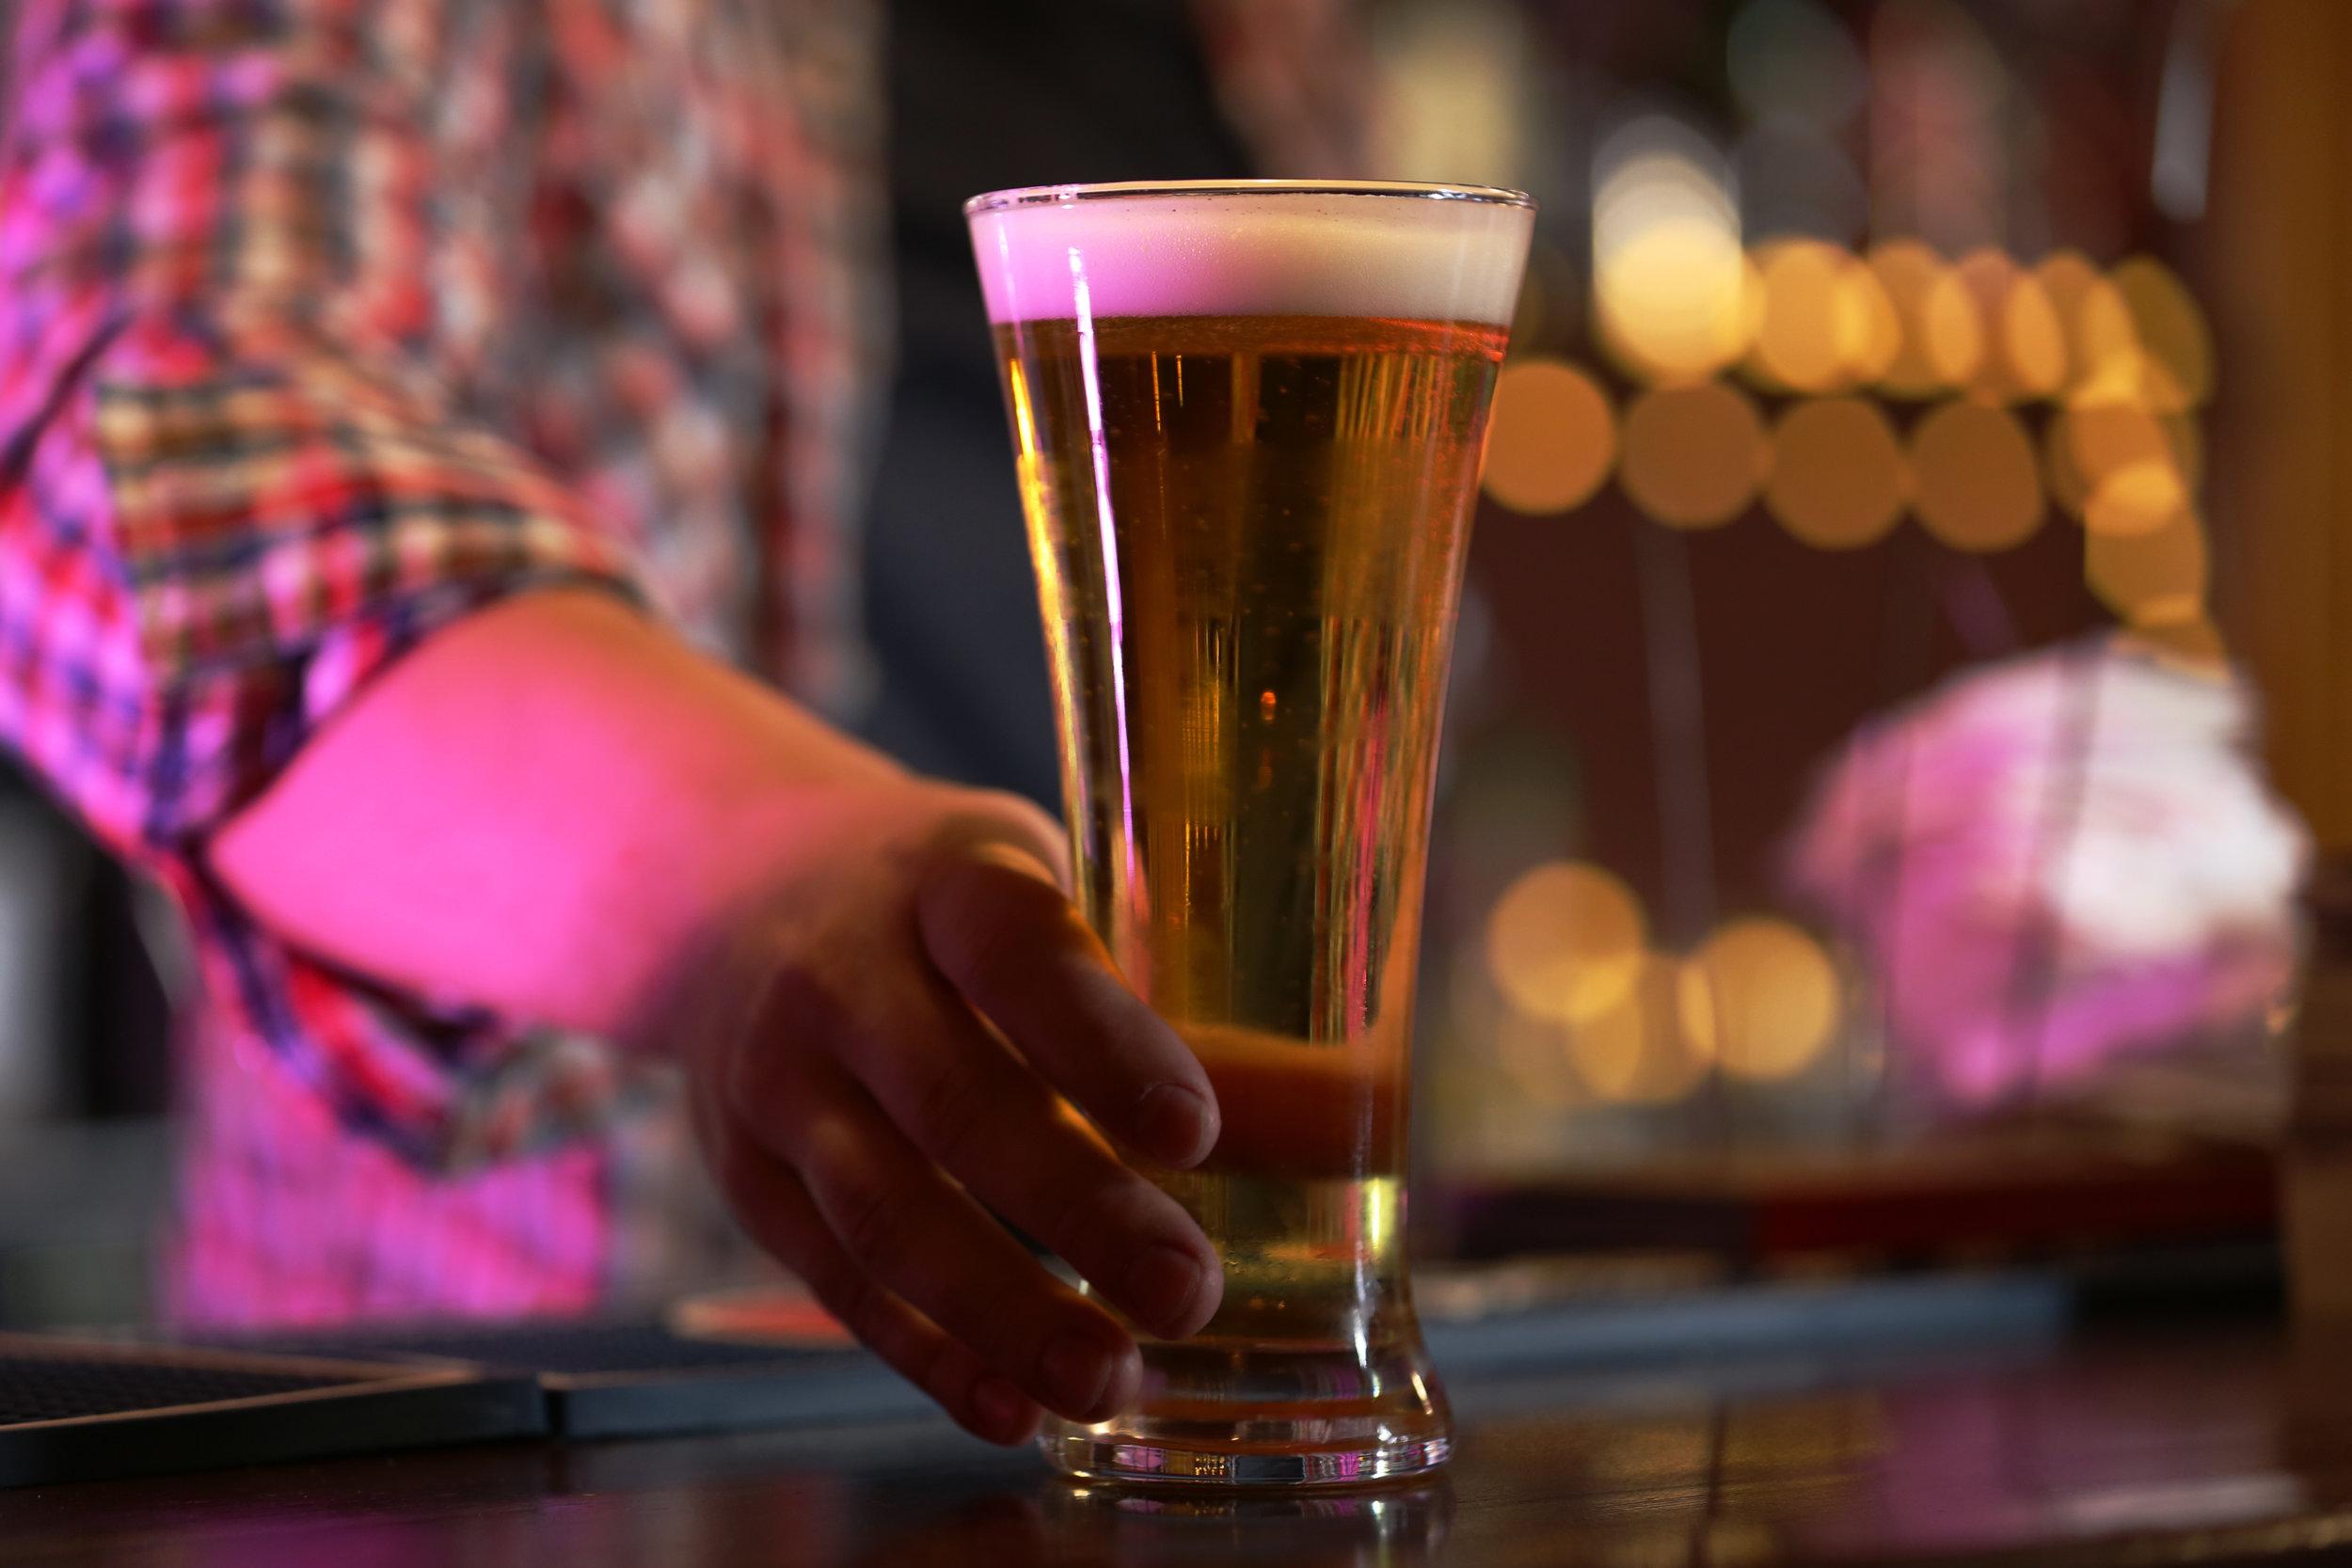 Lexington Brewery Tour and Beer Tasting, Lexington Limo Tour